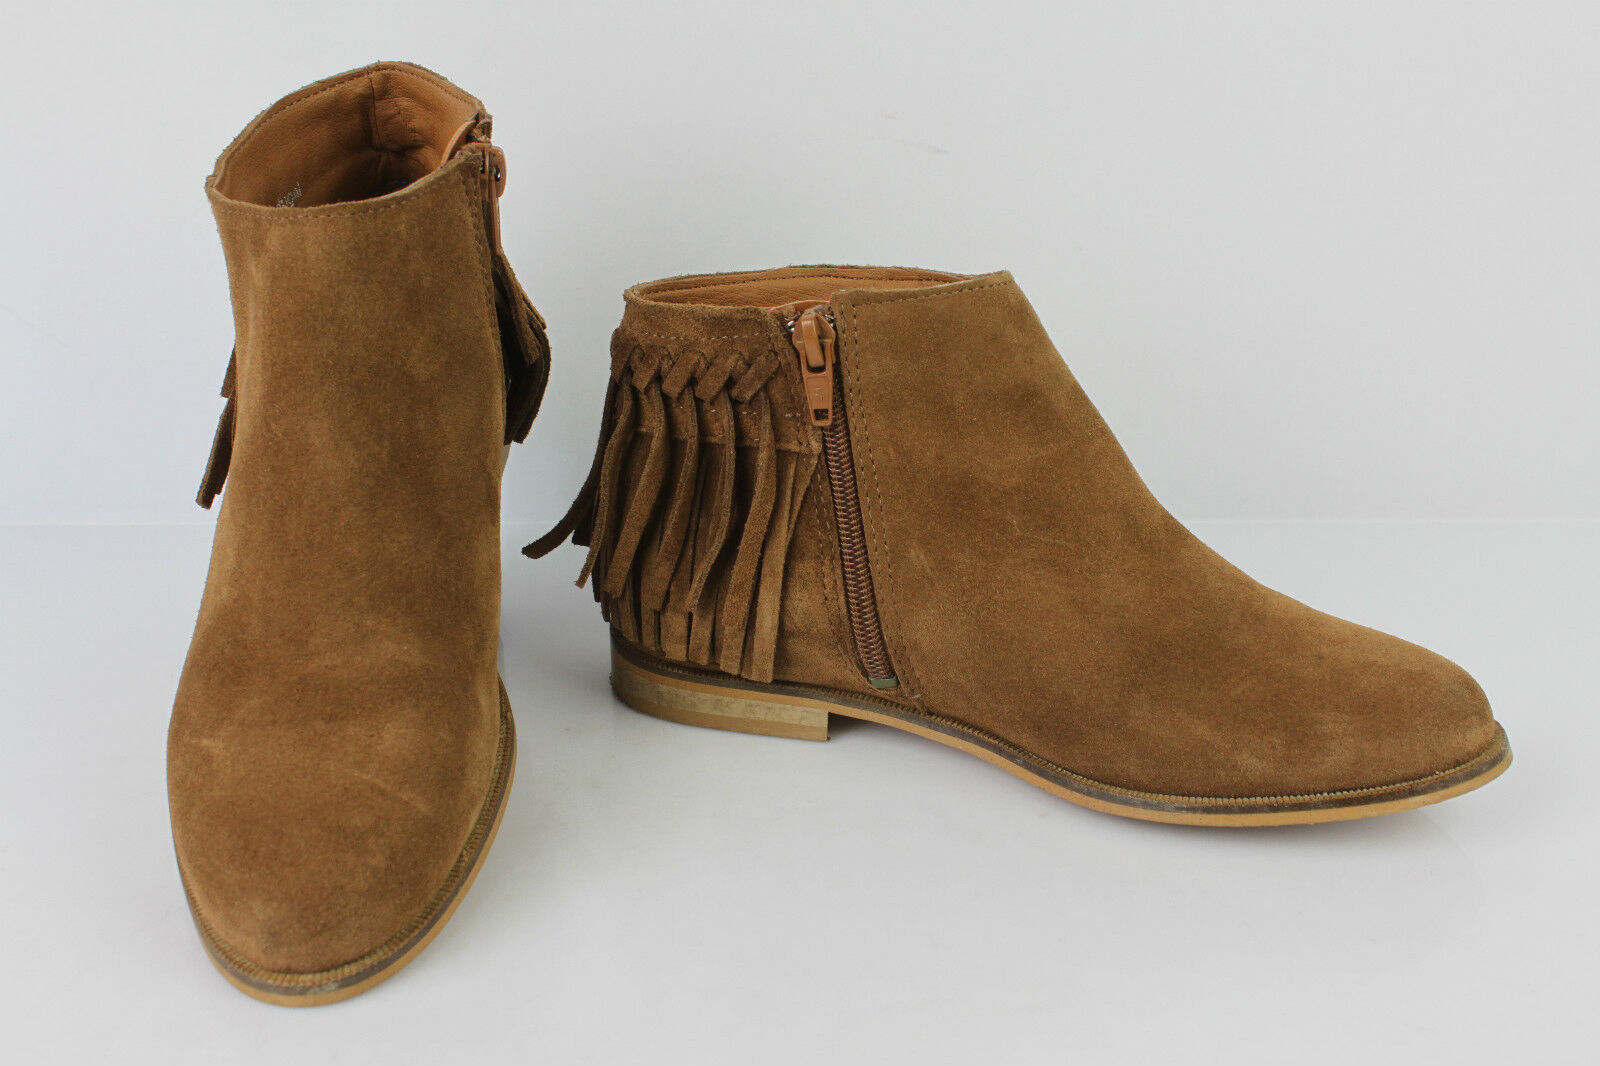 Bottines Boots à Franges ANDRE Daim brown T 35 TBE